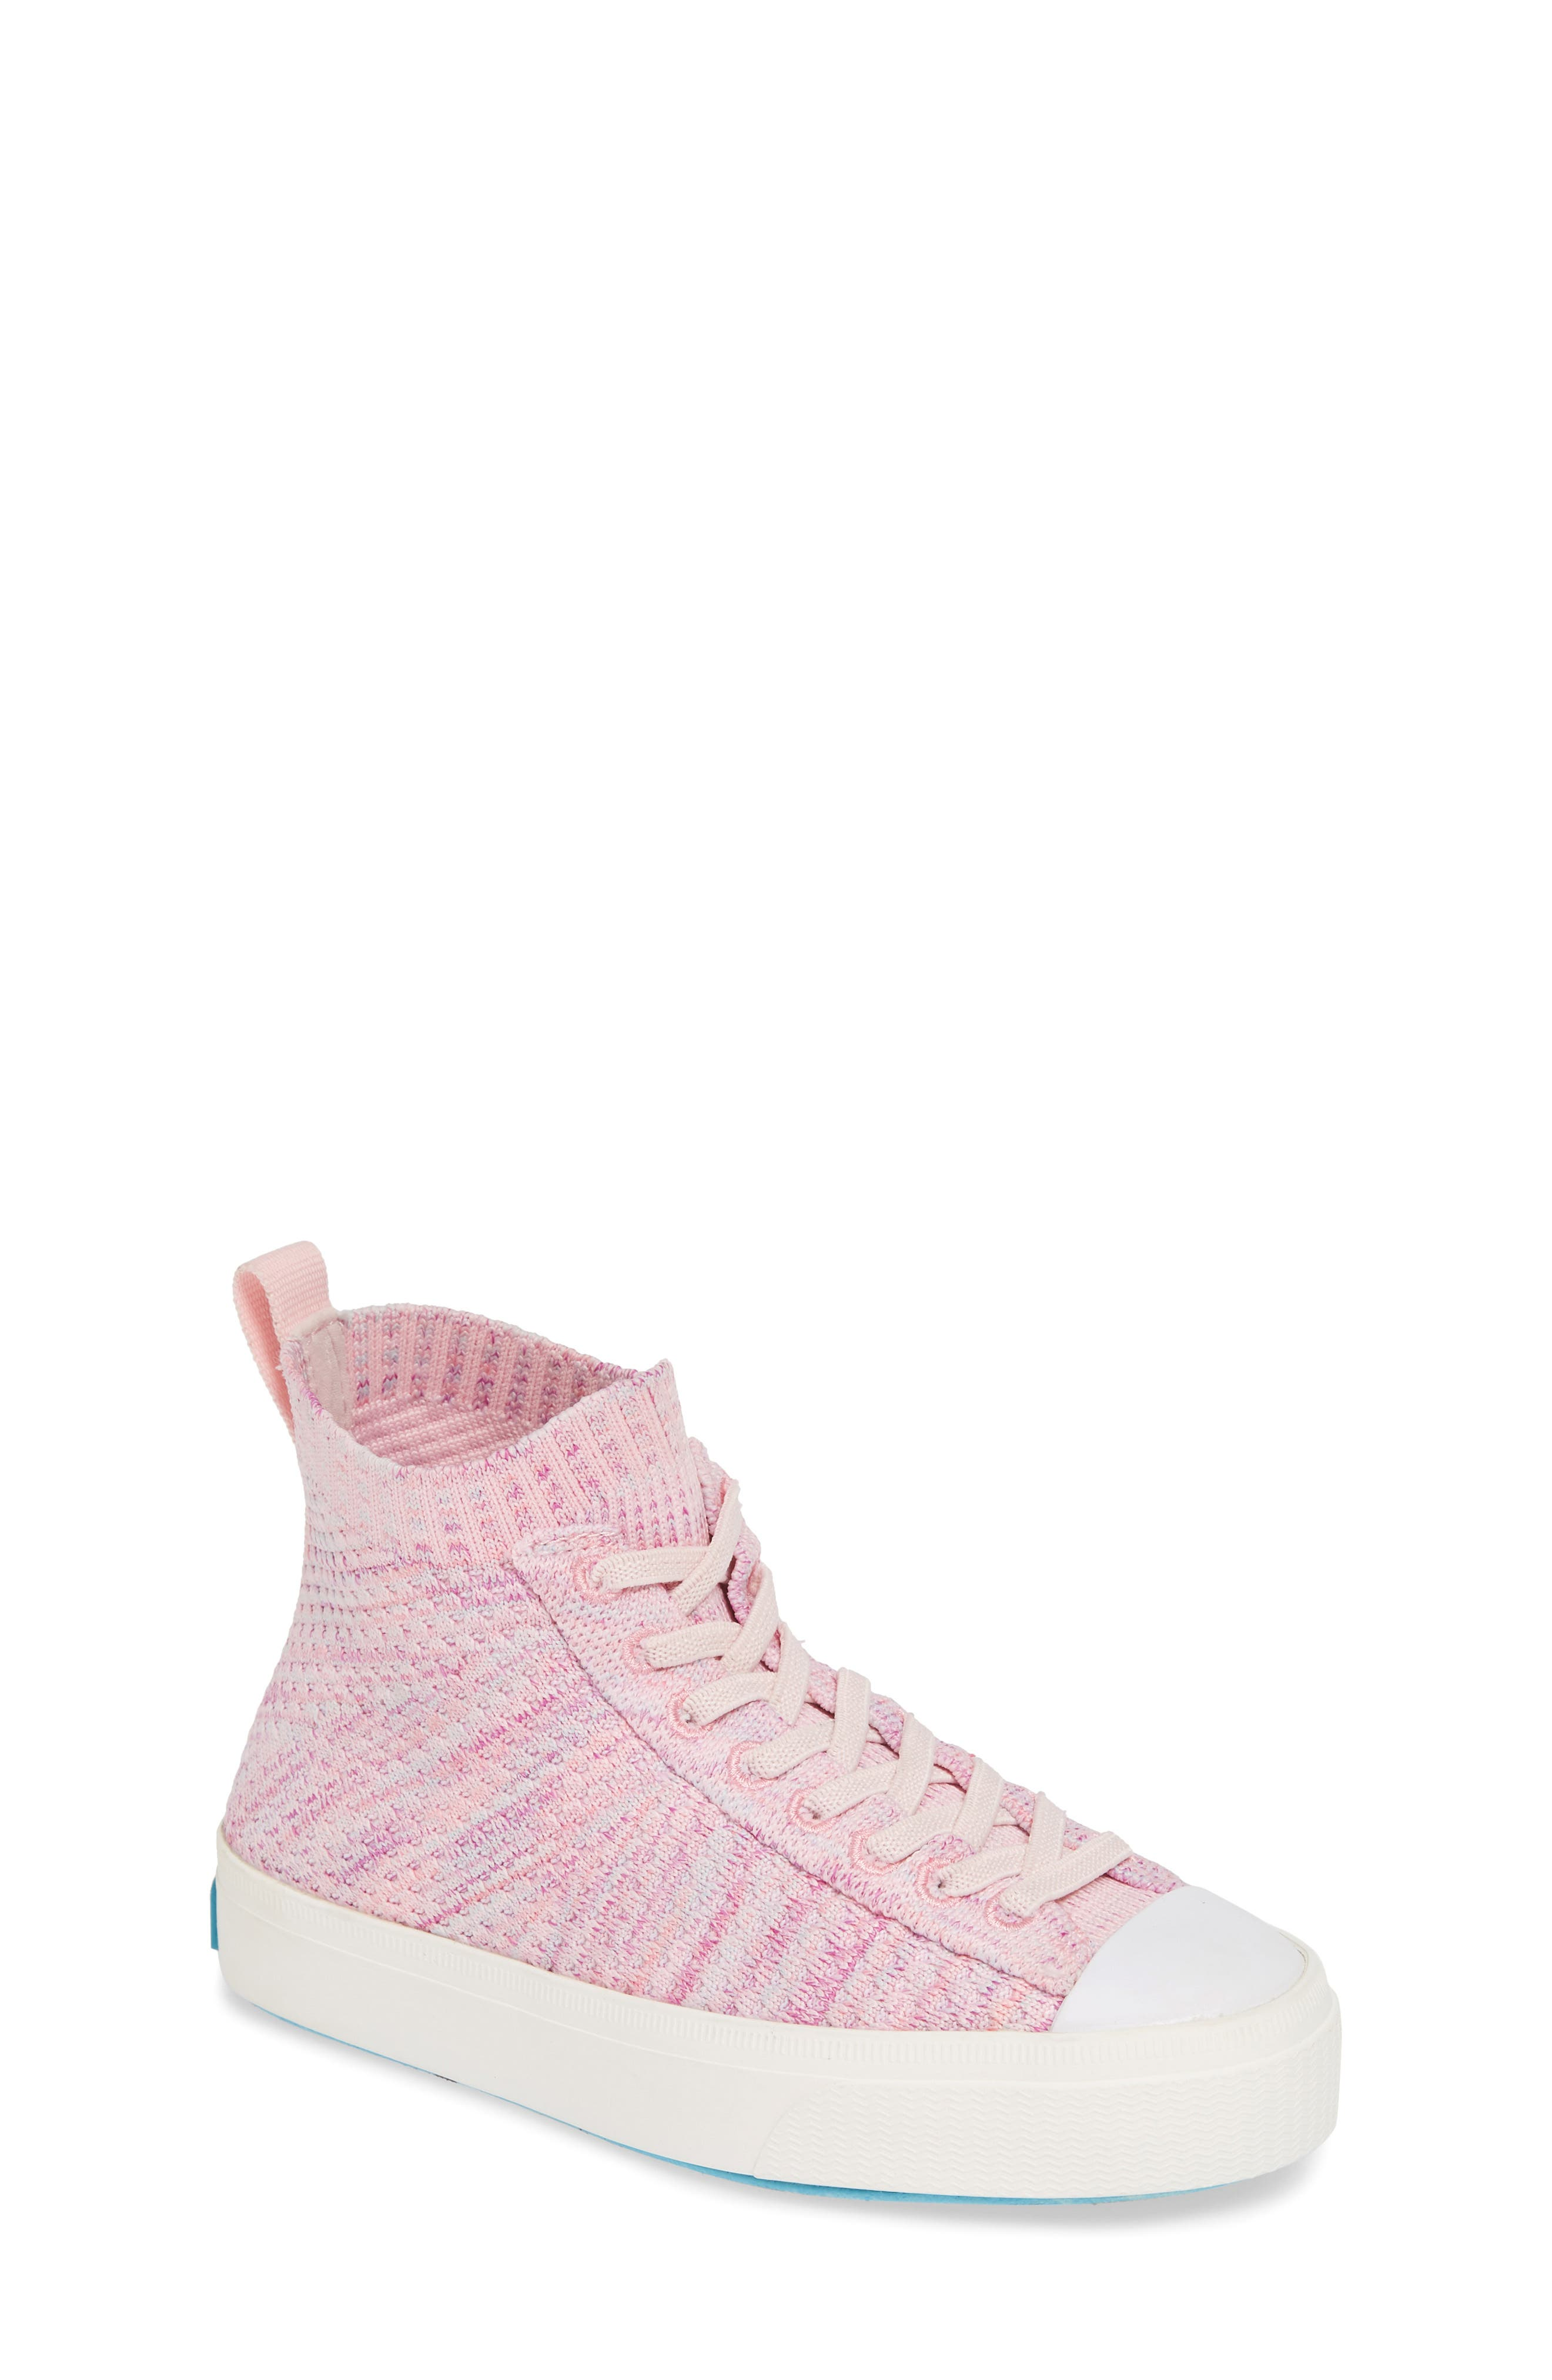 ea98c6fe8981 Native Shoes Jefferson 2.0 Liteknit Vegan High Top Sneaker